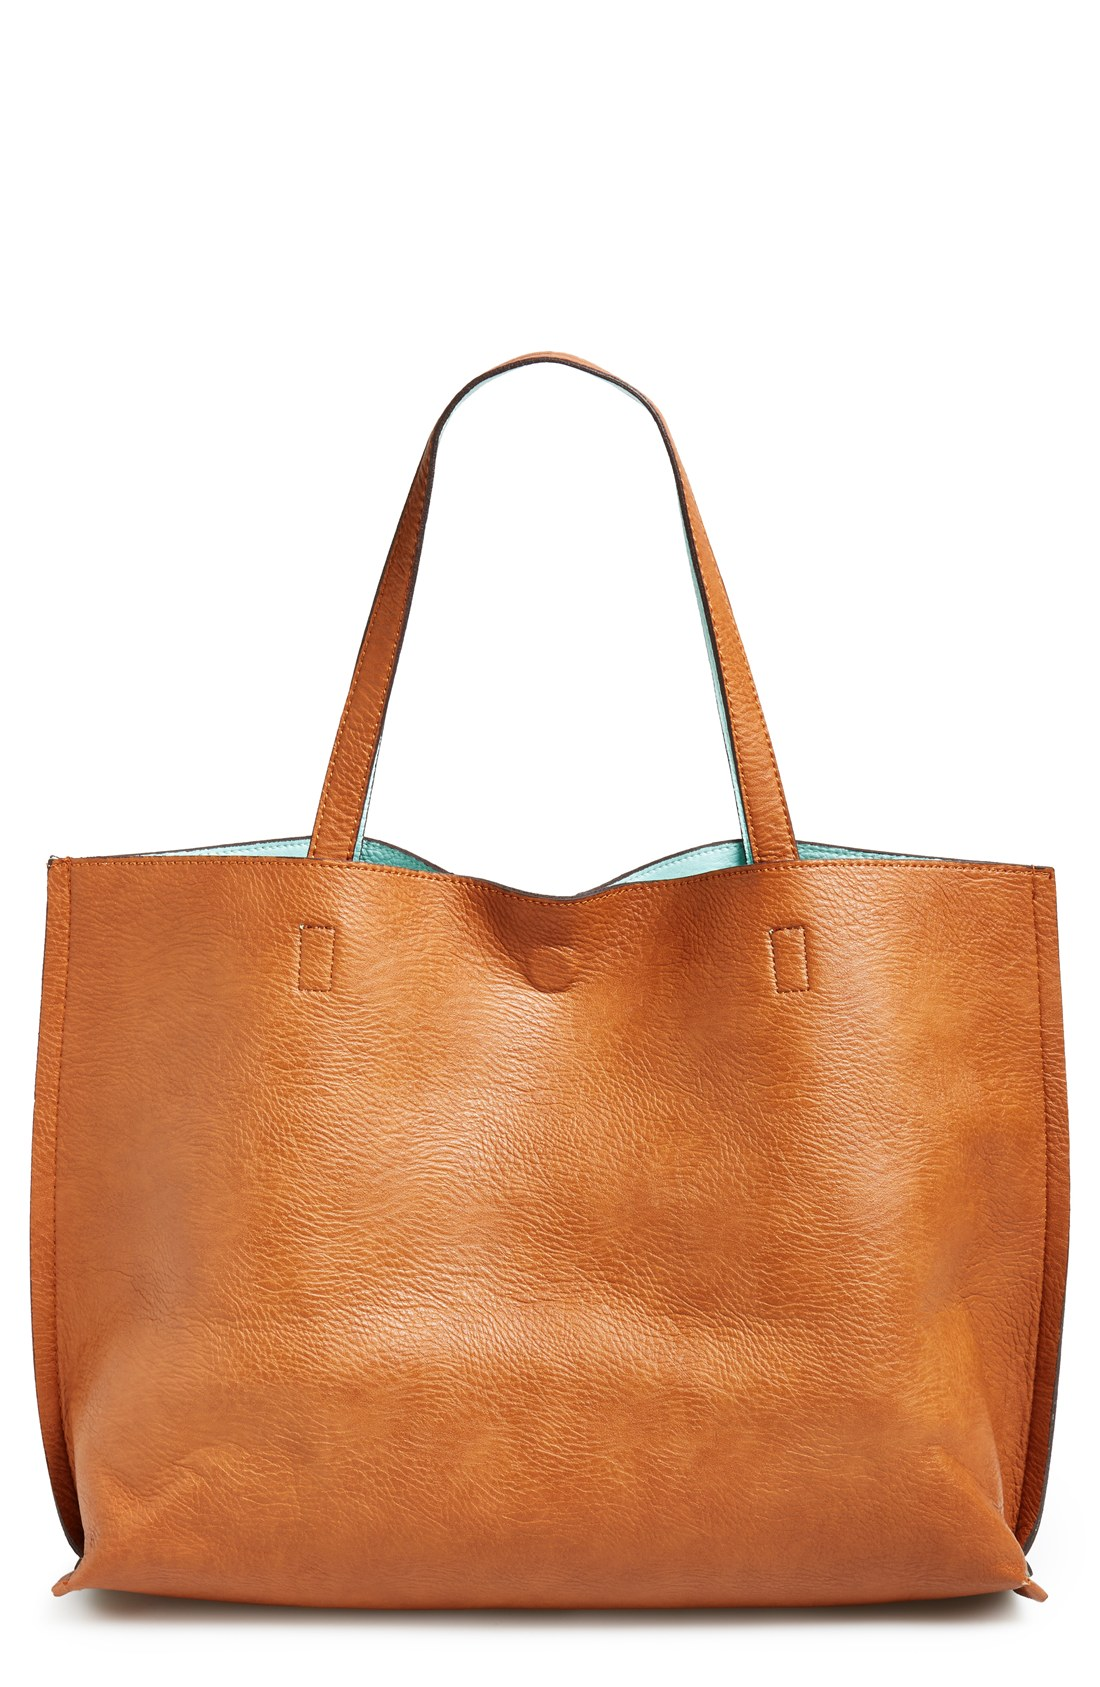 brown tote bag.jpg